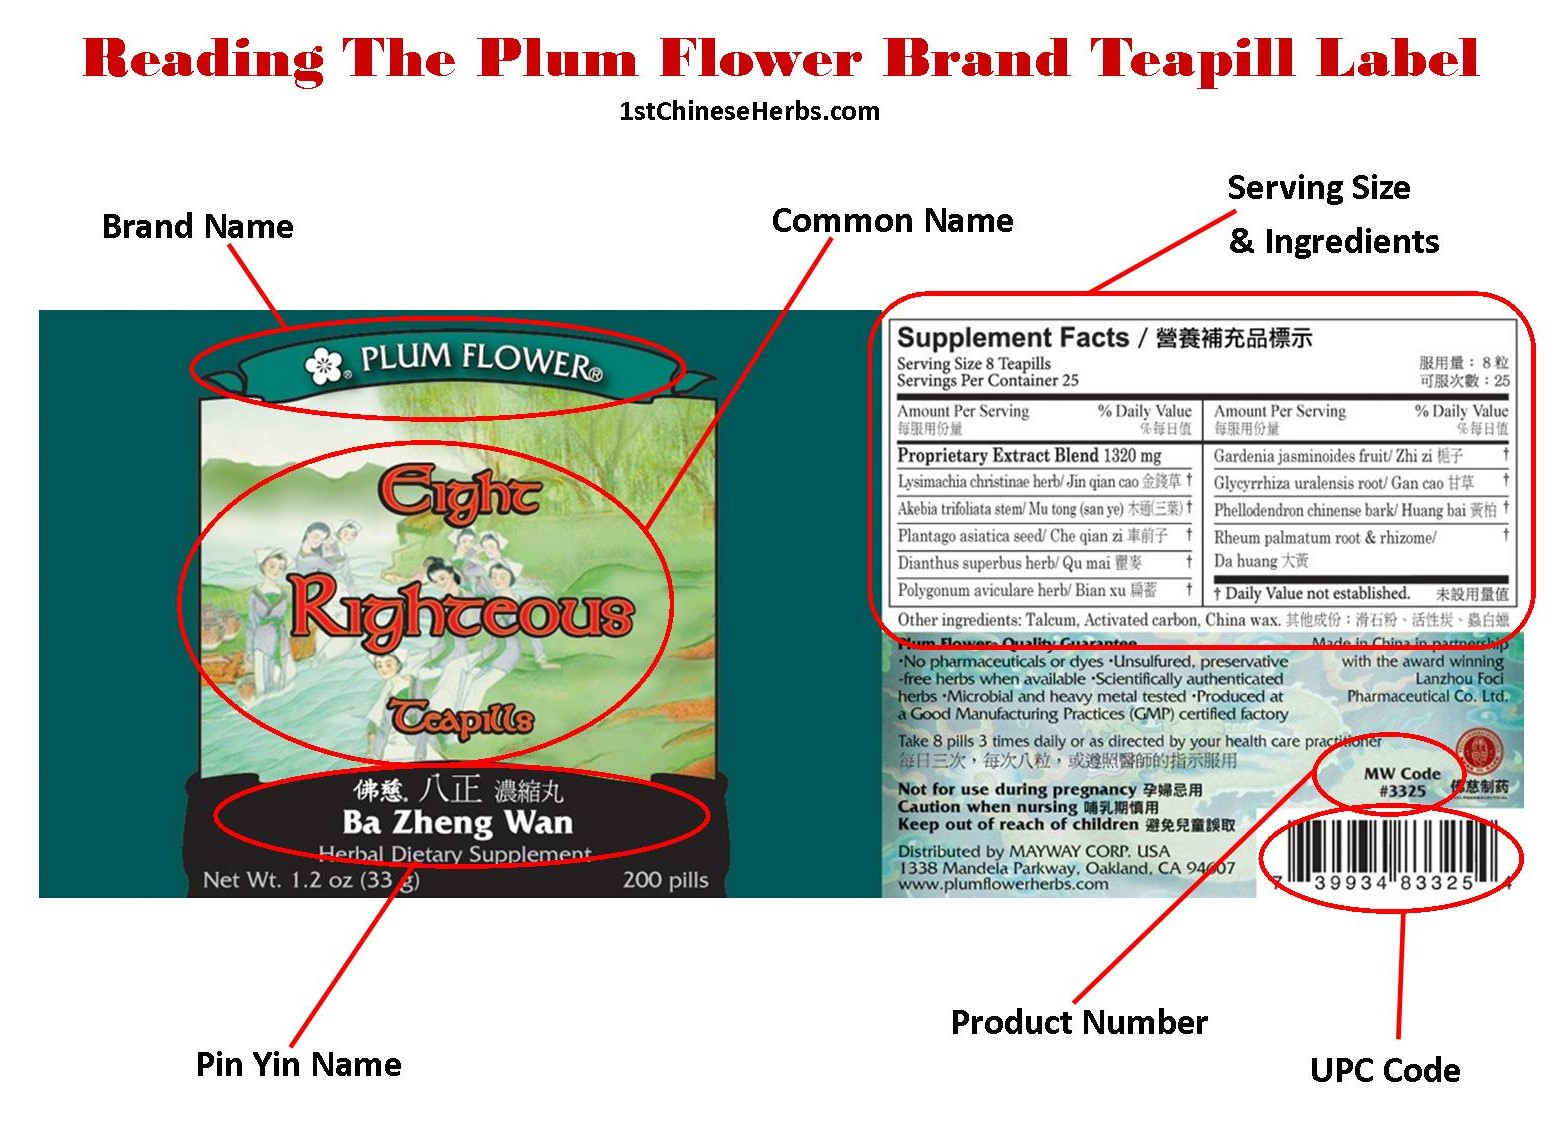 read-plum-flower-label.jpg